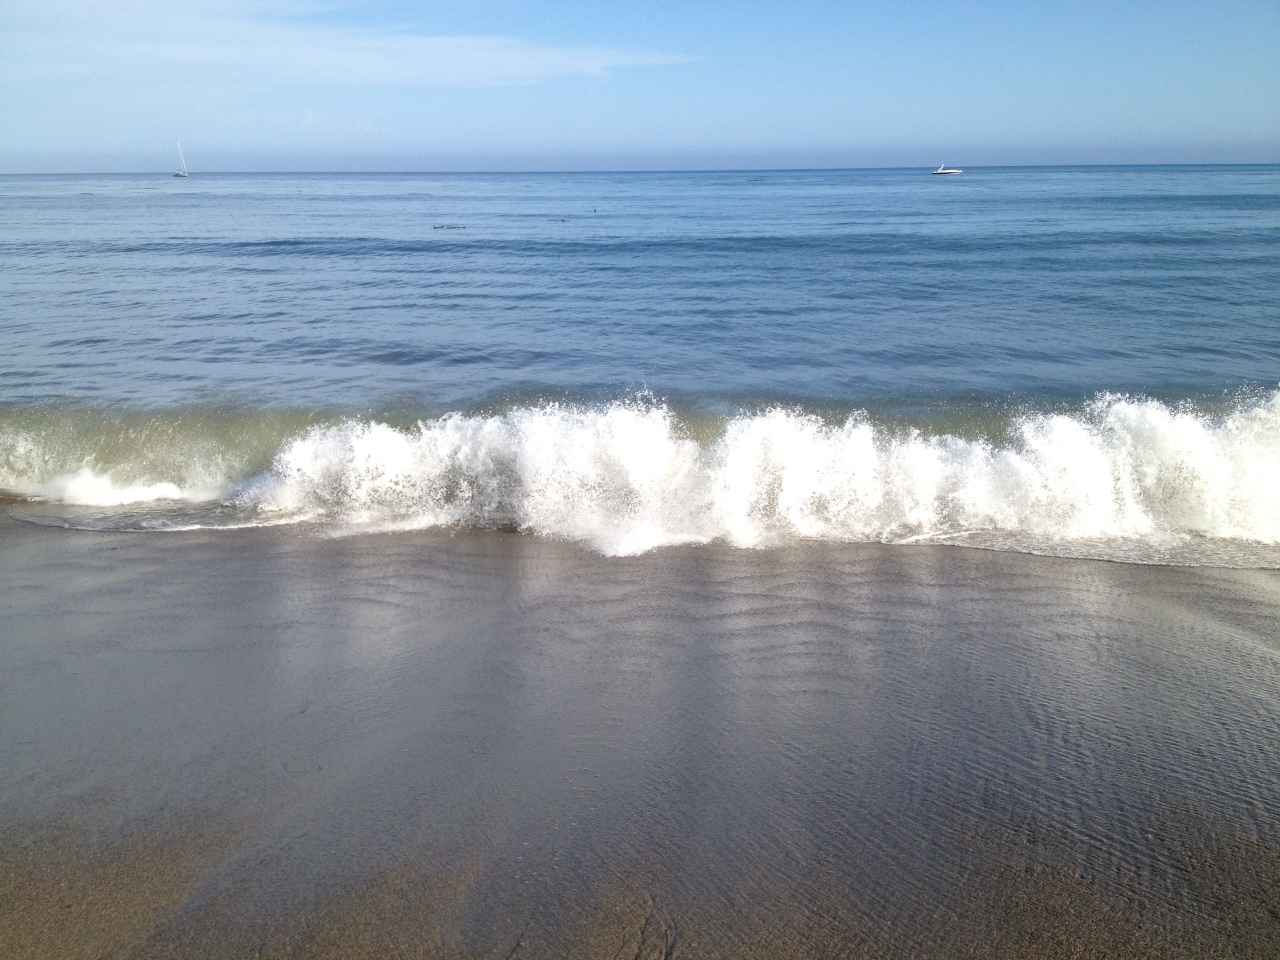 Malibu, August 2012